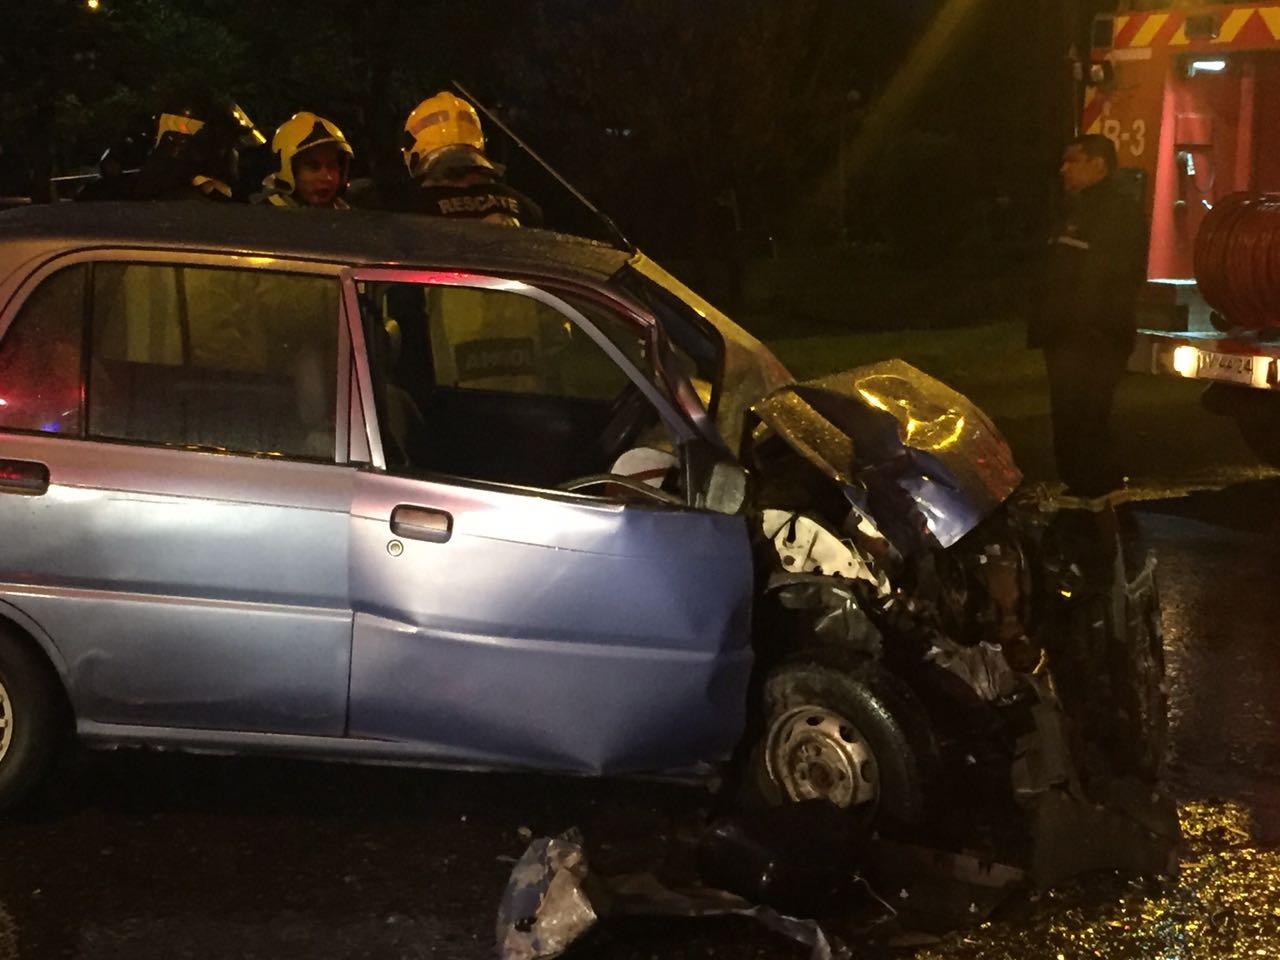 Dos personas resultaron lesionadas tras accidente de tránsito ocurrido esta mañana en Angol